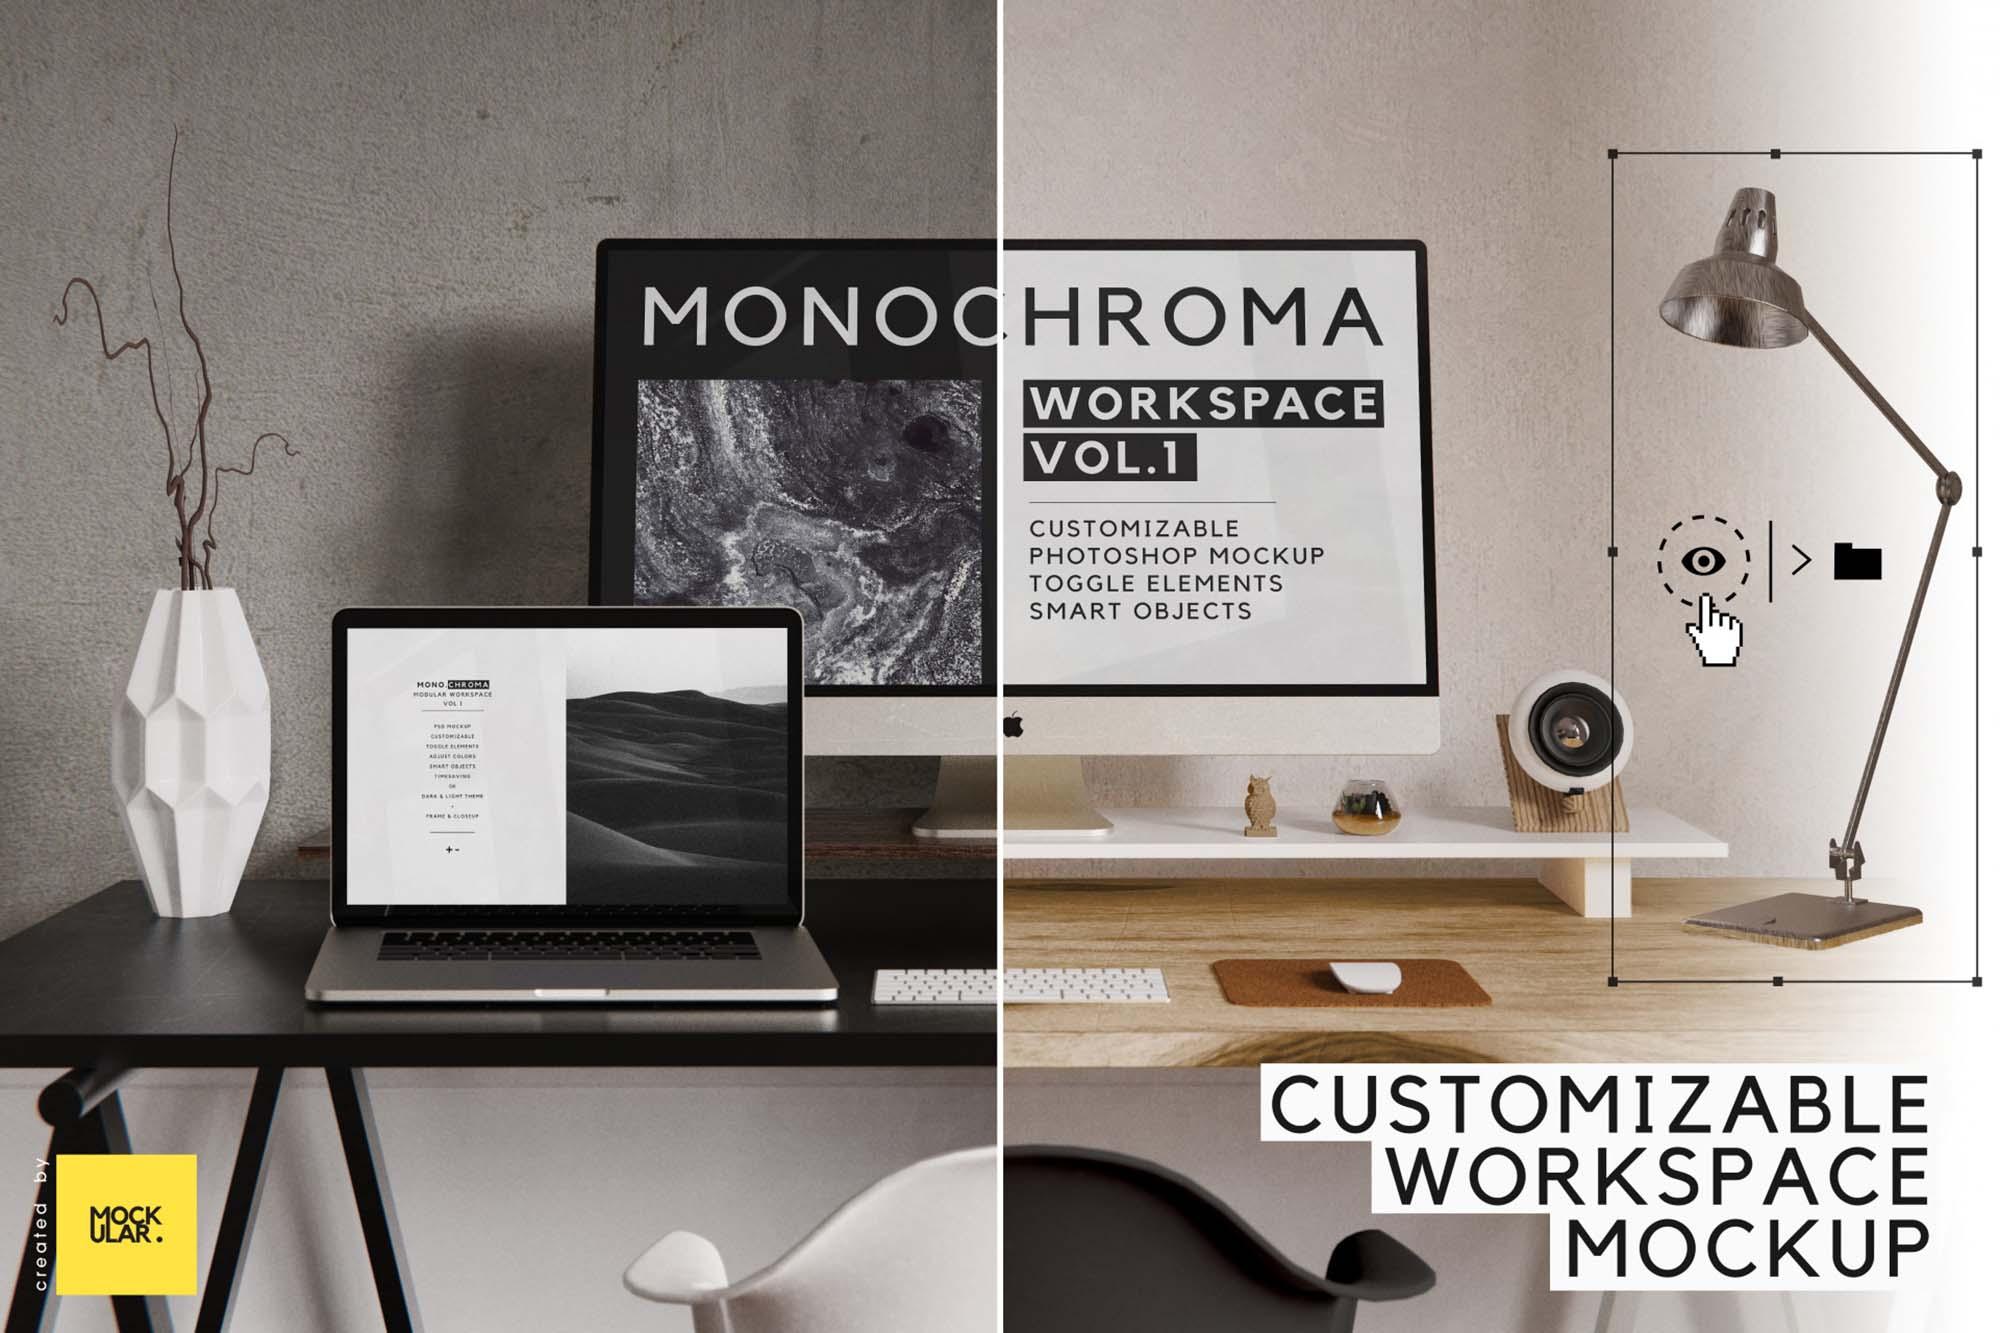 Customizable Workspace Mockup